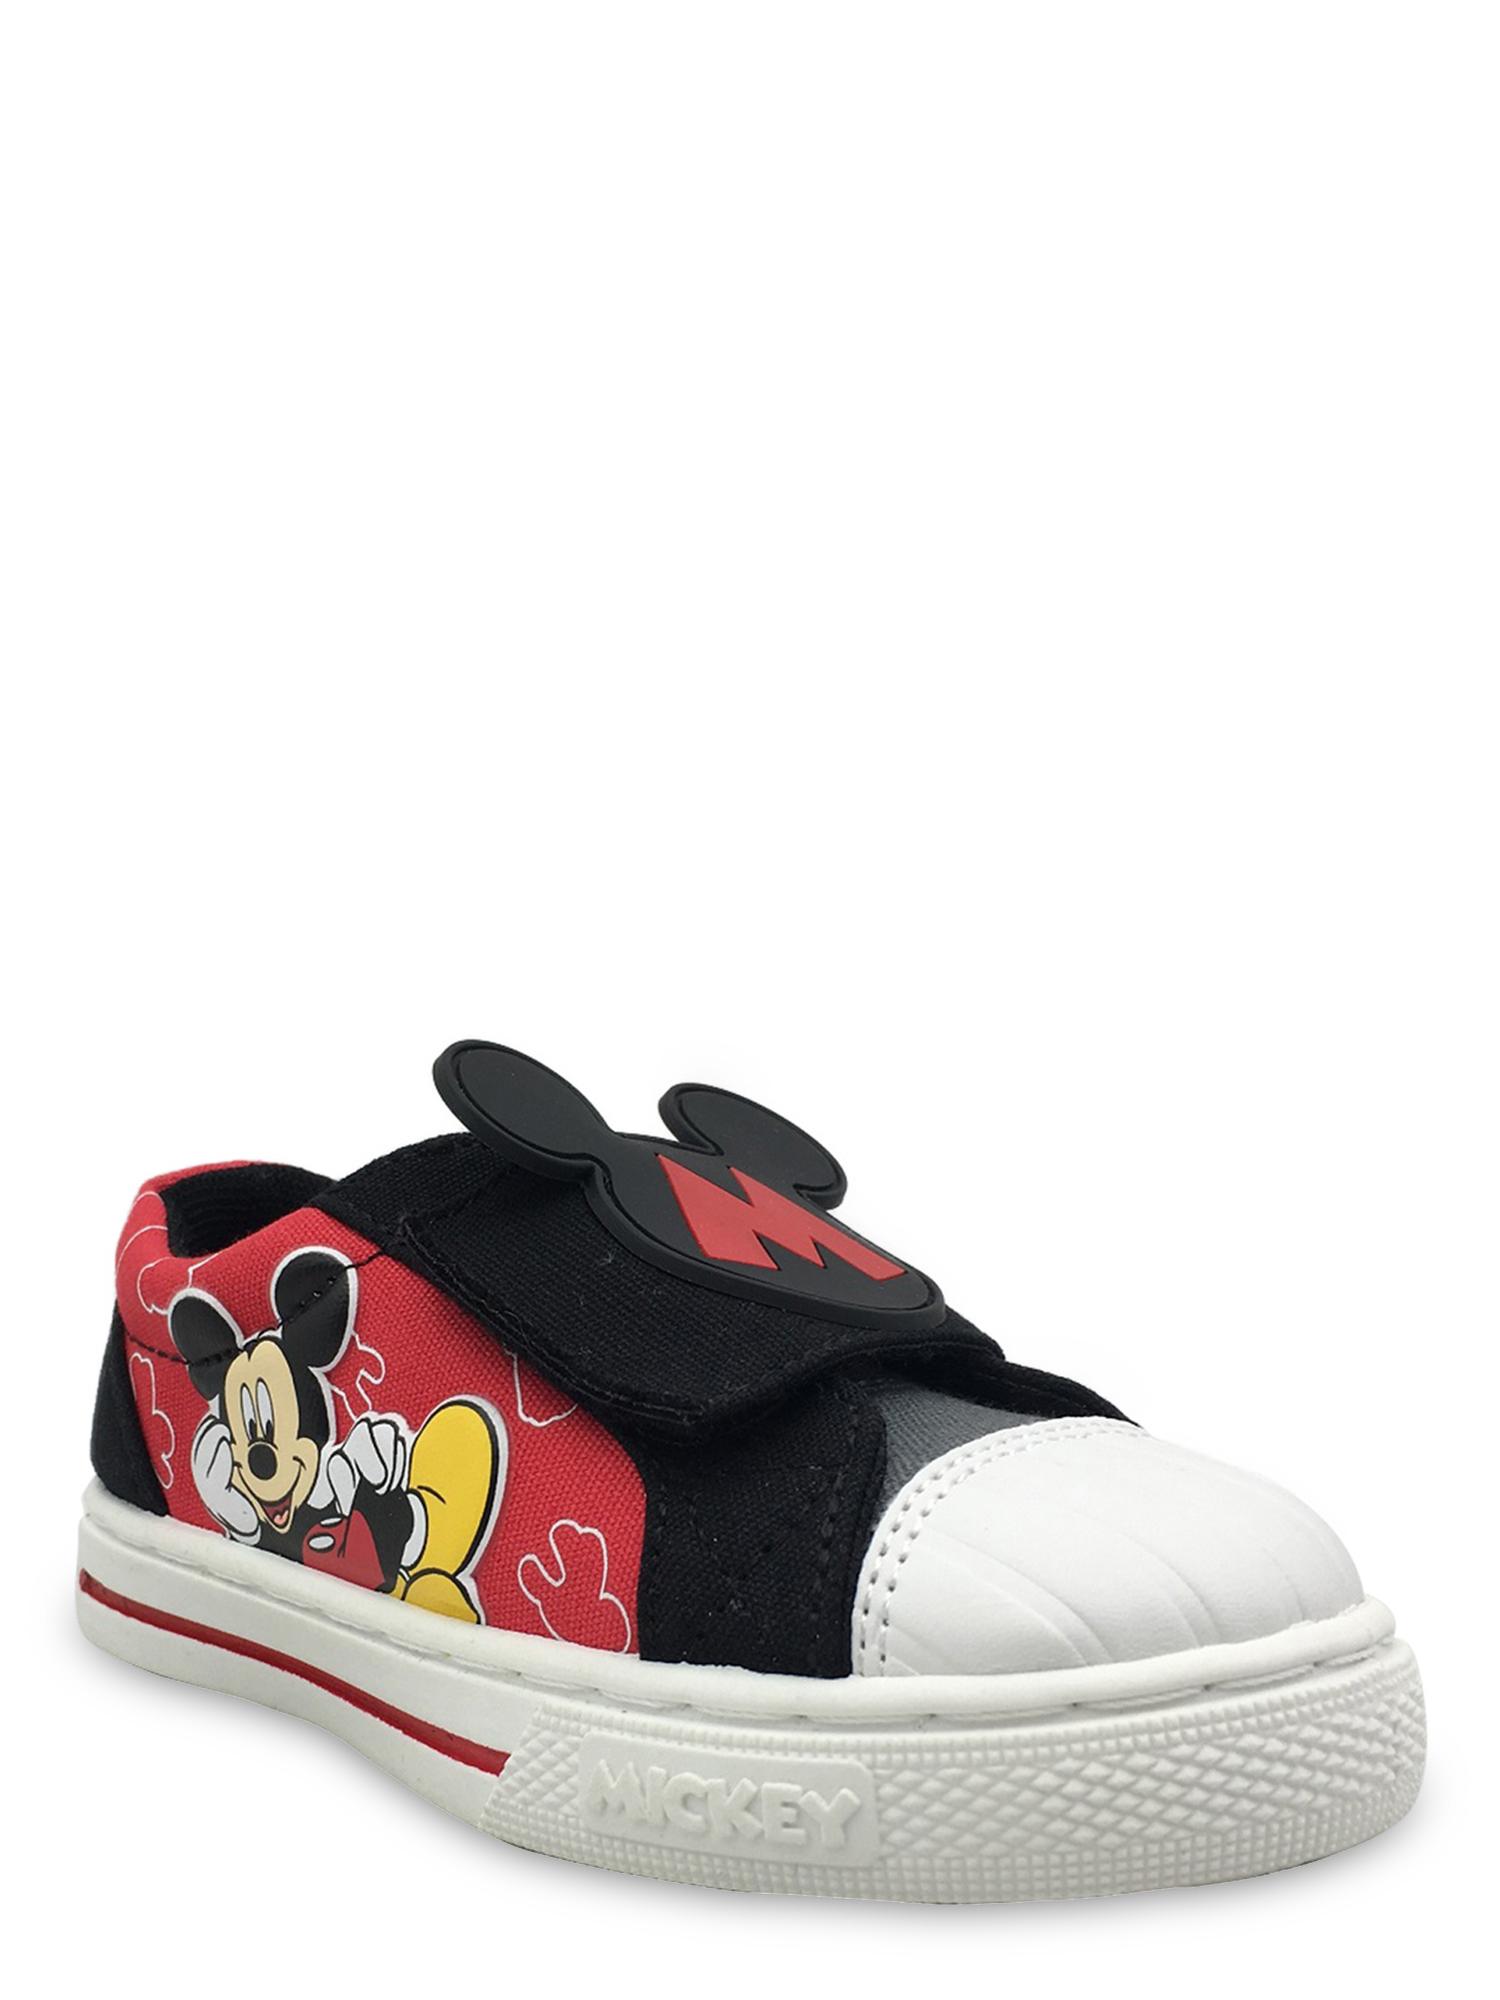 Mickey Mouse Cap Toe Casual Sn...